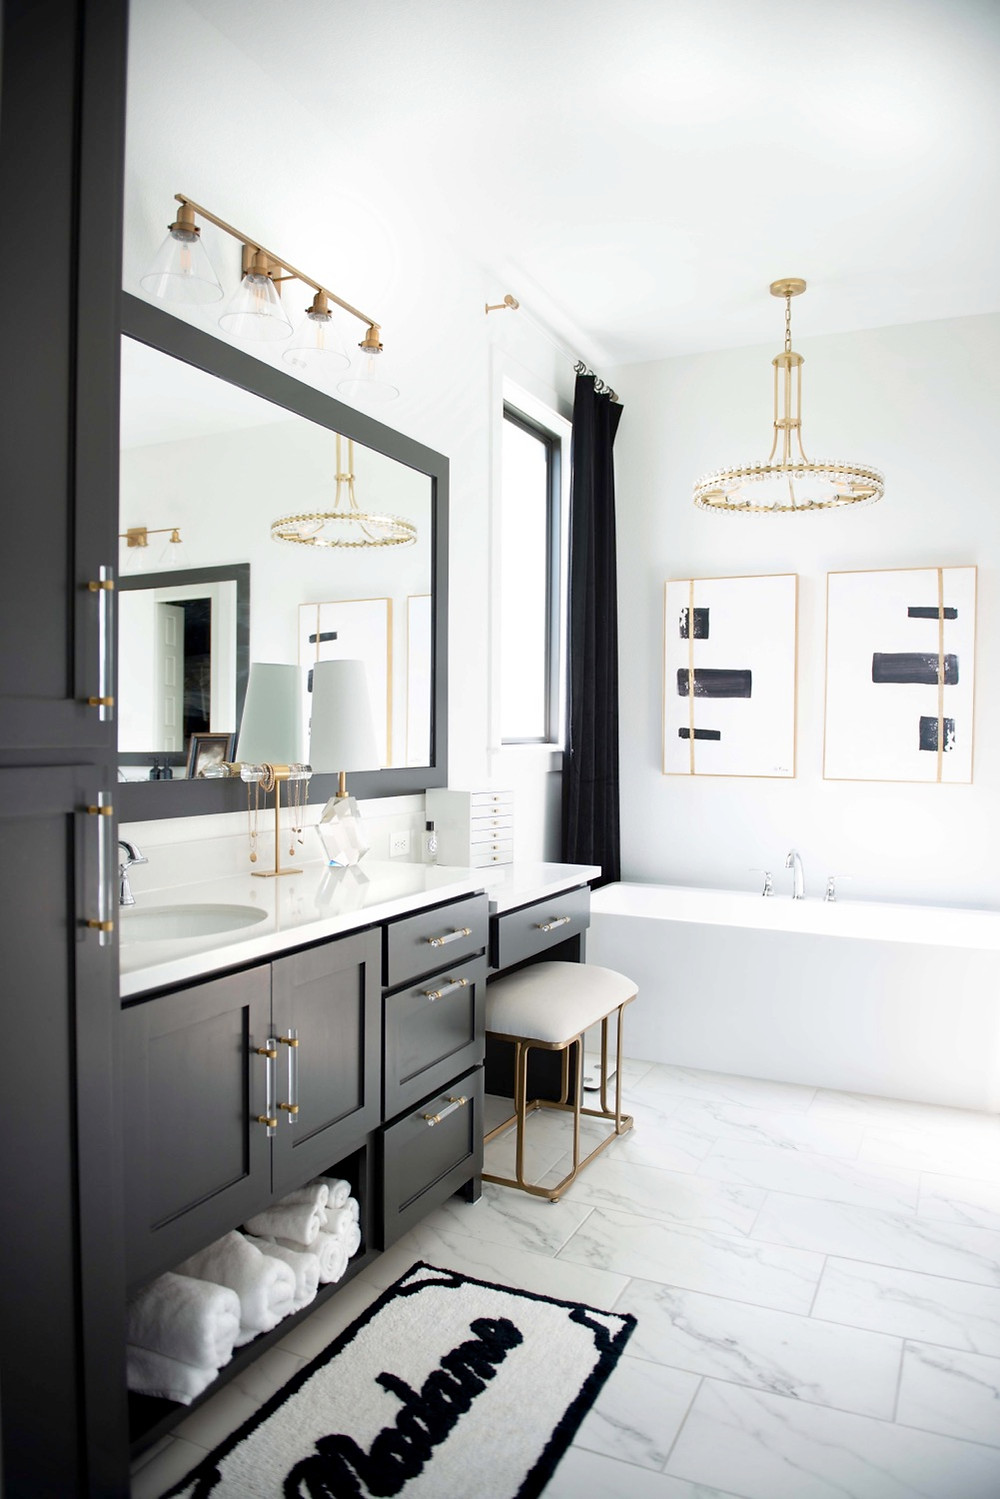 Kendra Scott jewelry box sitting on a luxury bathroom vanity